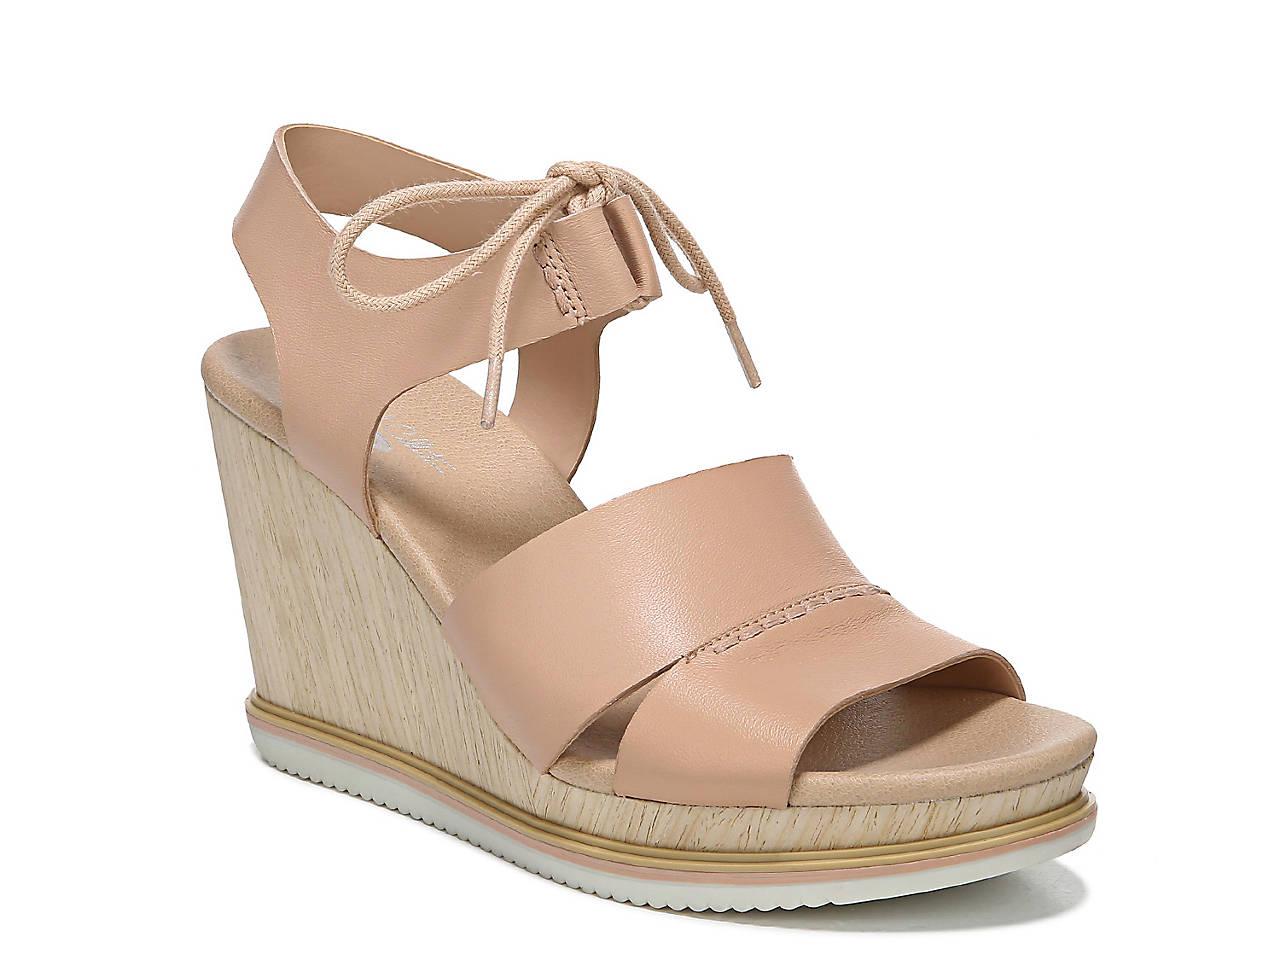 4fef611eaeb Dr. Scholl s Summertime Wedge Sandal Women s Shoes